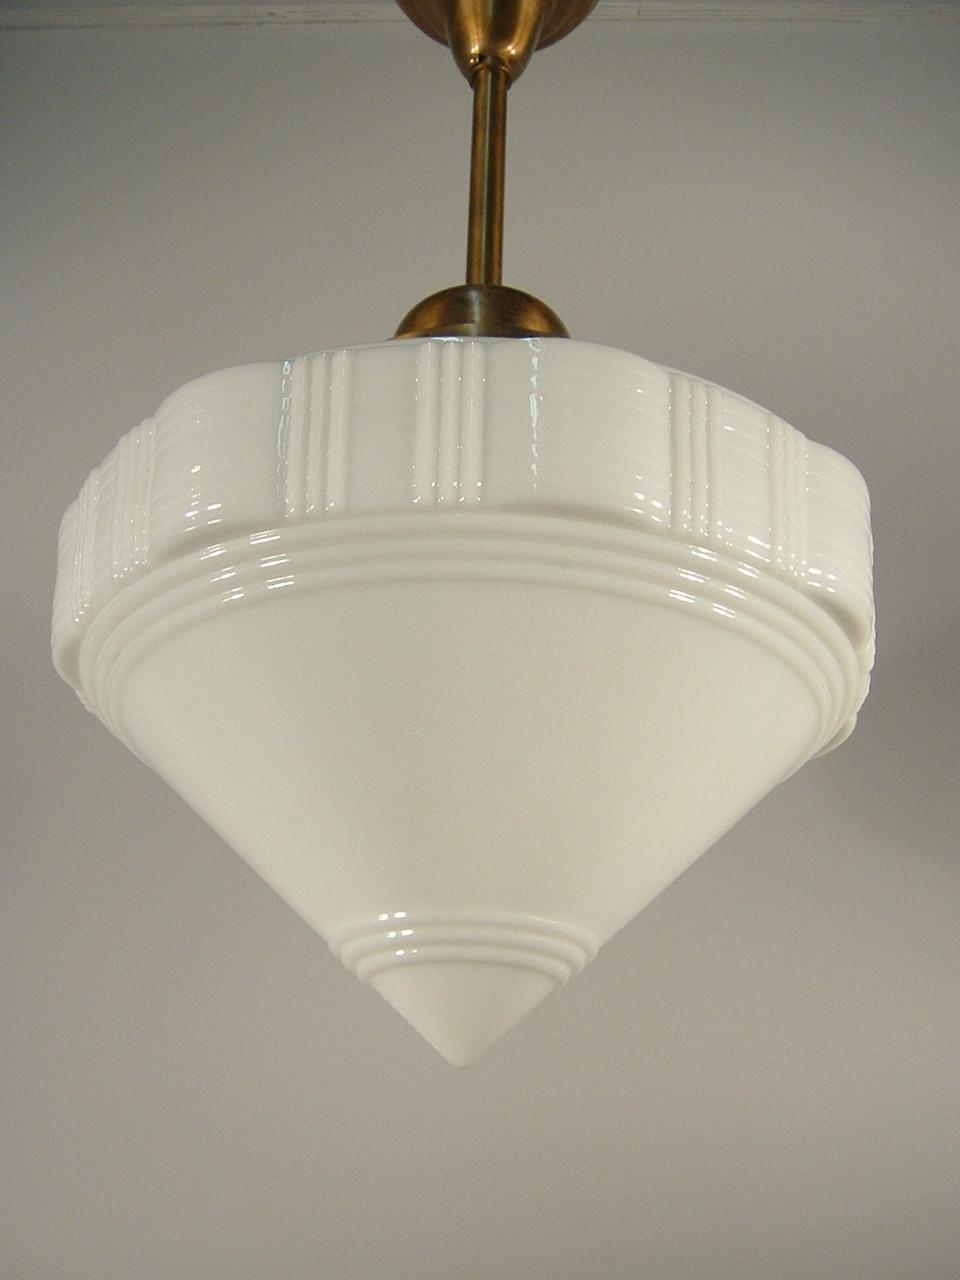 Restoration Hardware Lighting Pendants